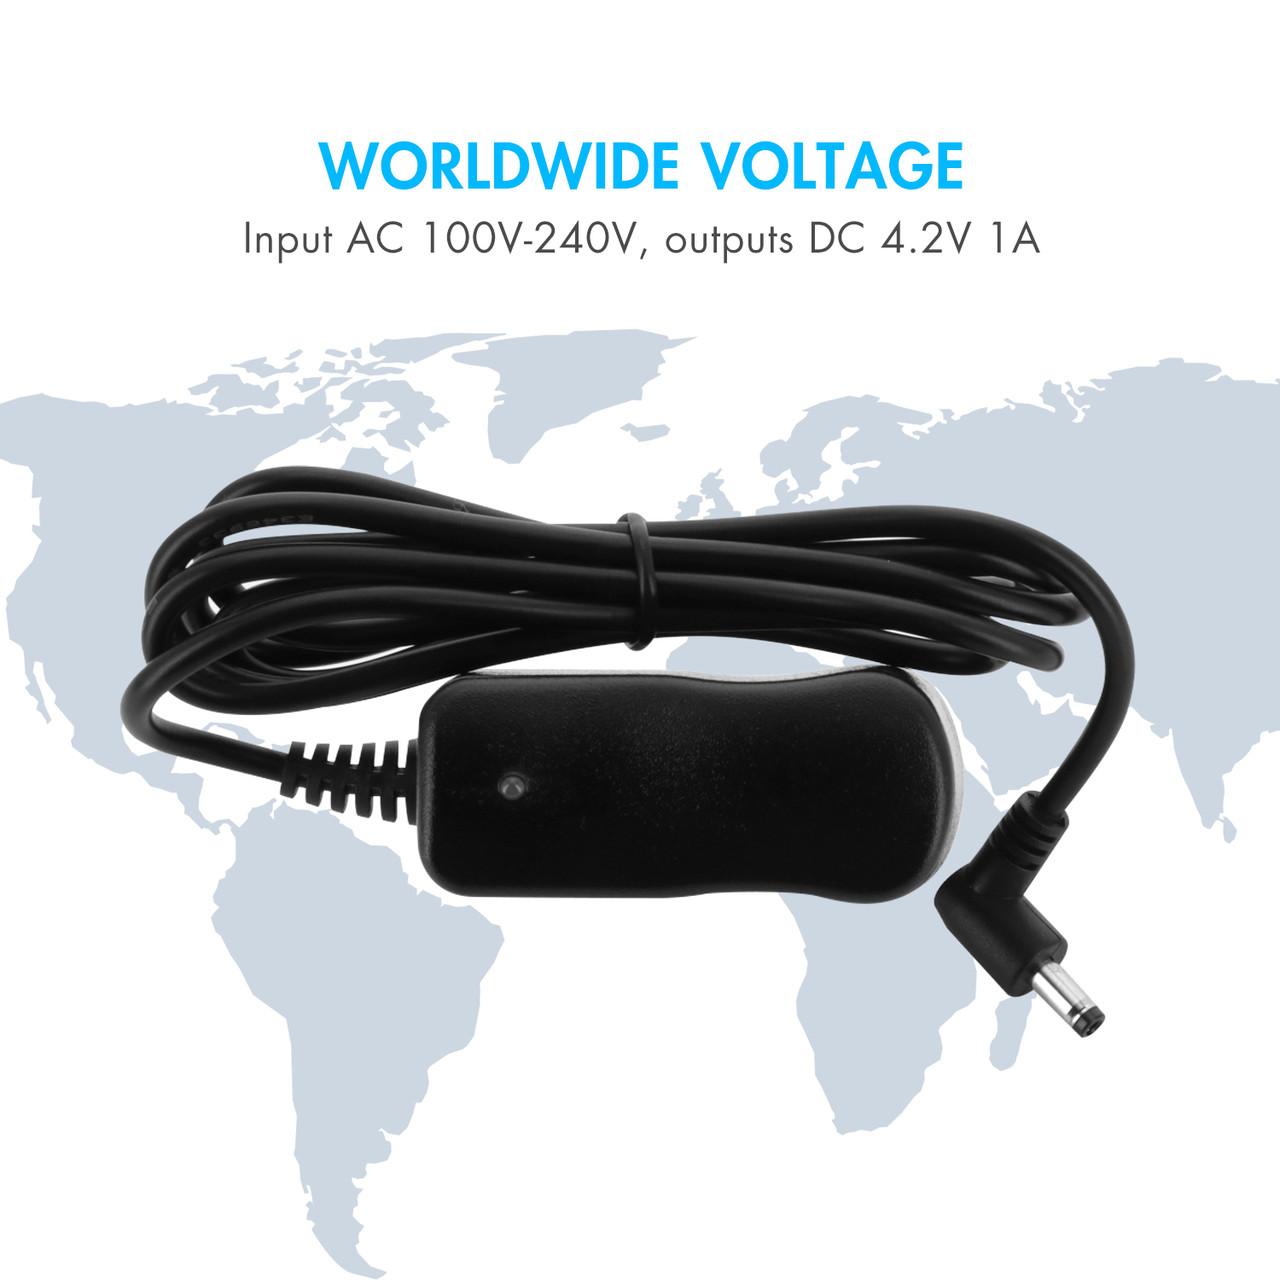 110V-240V AC to 3.7V DC Li-ion Battery Charger w/ DC Connector